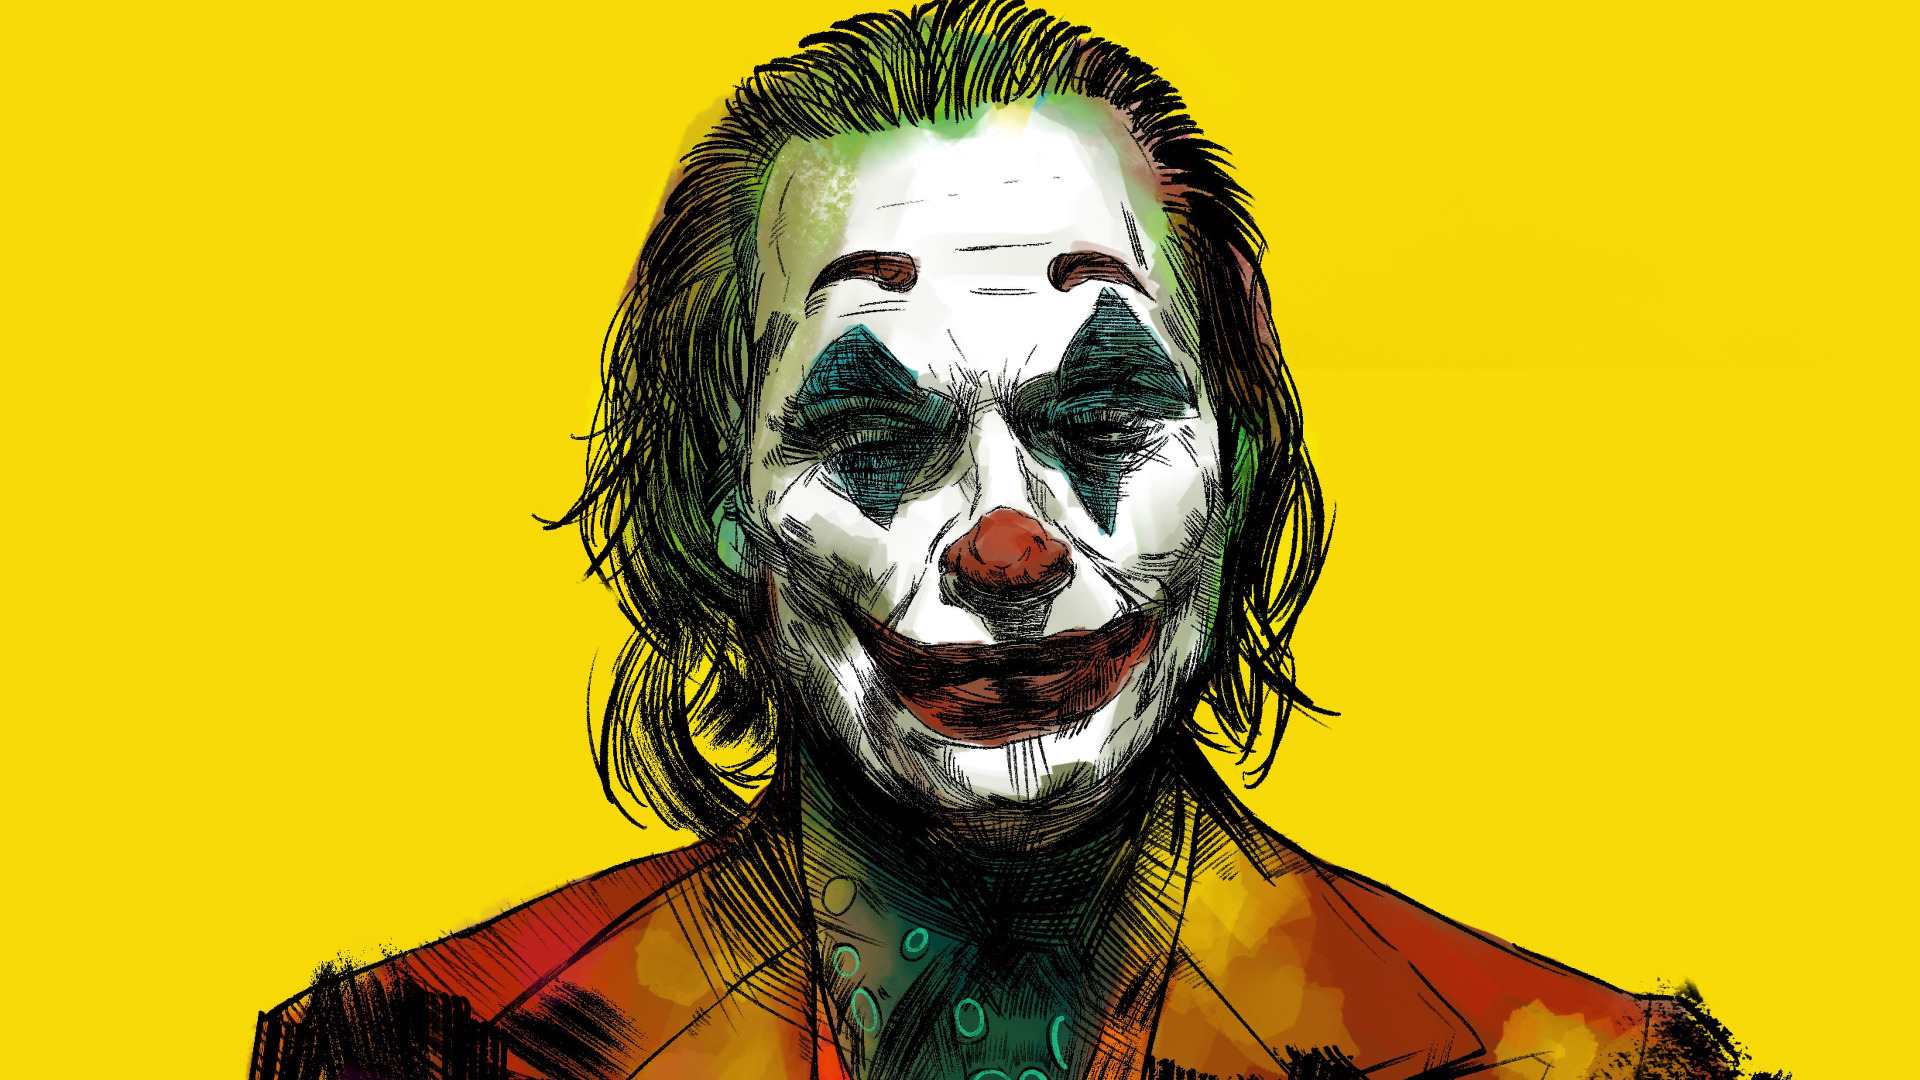 1920x1080 2019 Joker Movie 4k 1080P Laptop Full HD ...